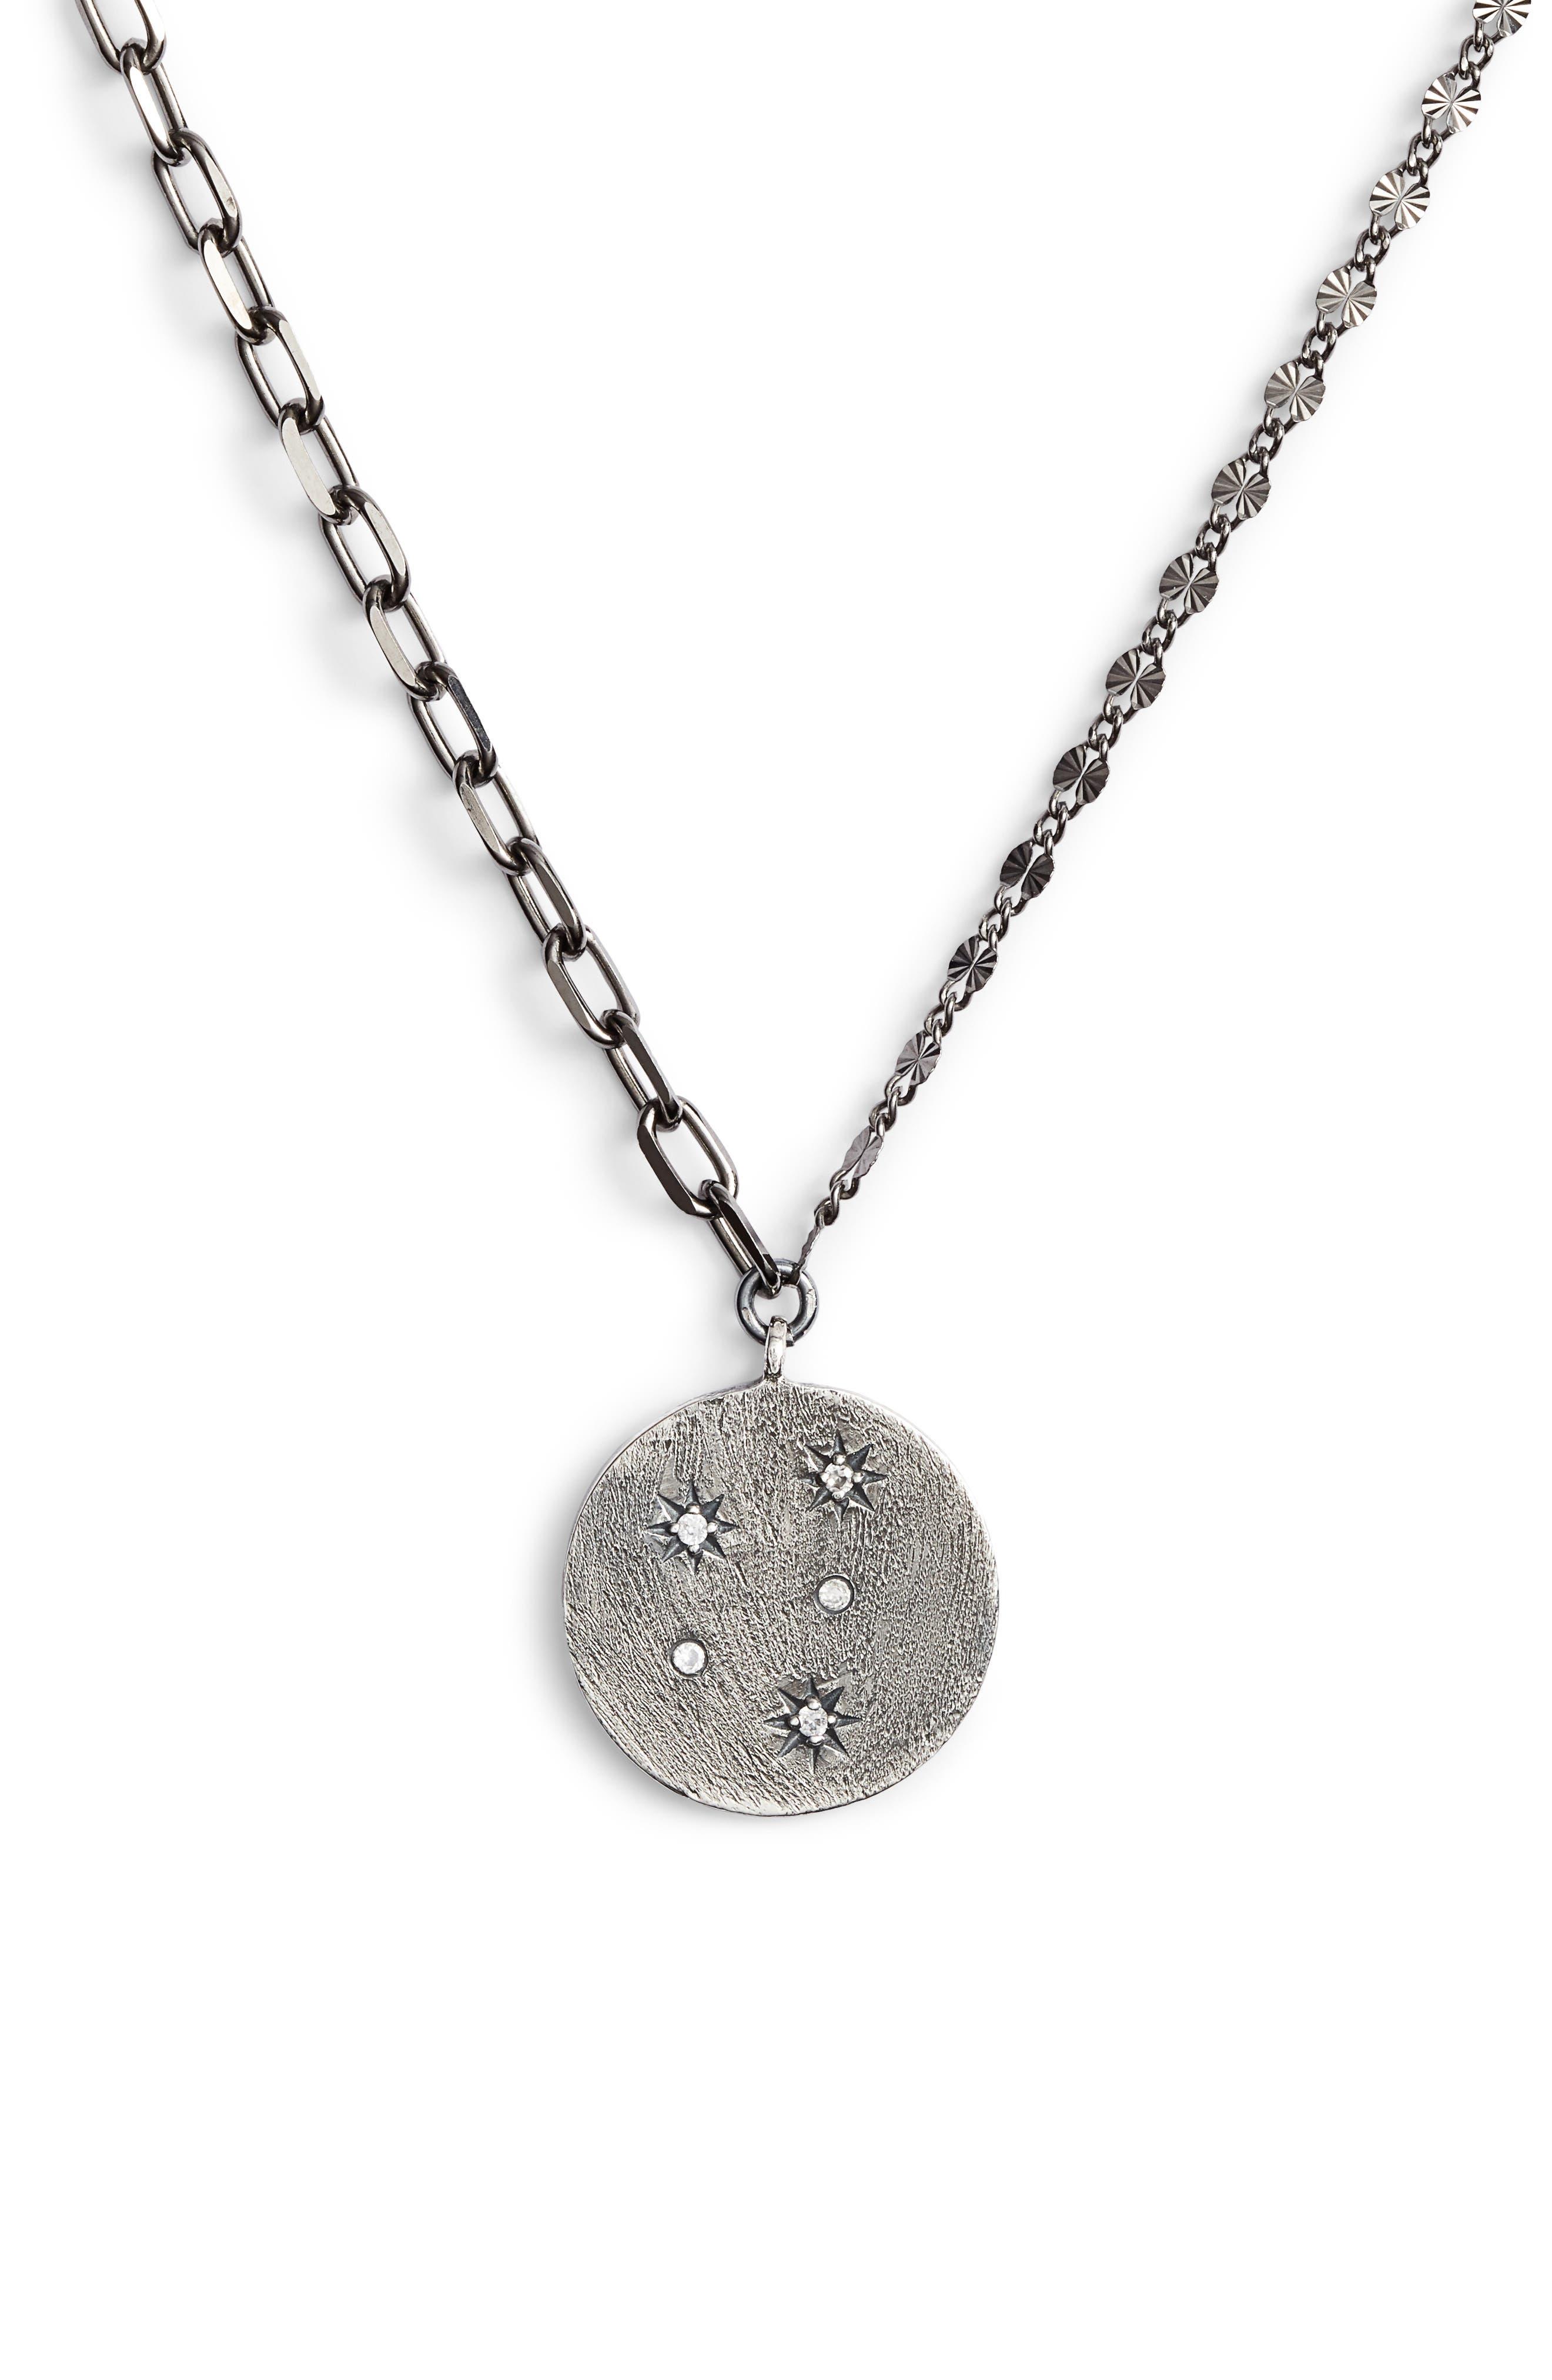 Lara Starburst Pendant Necklace